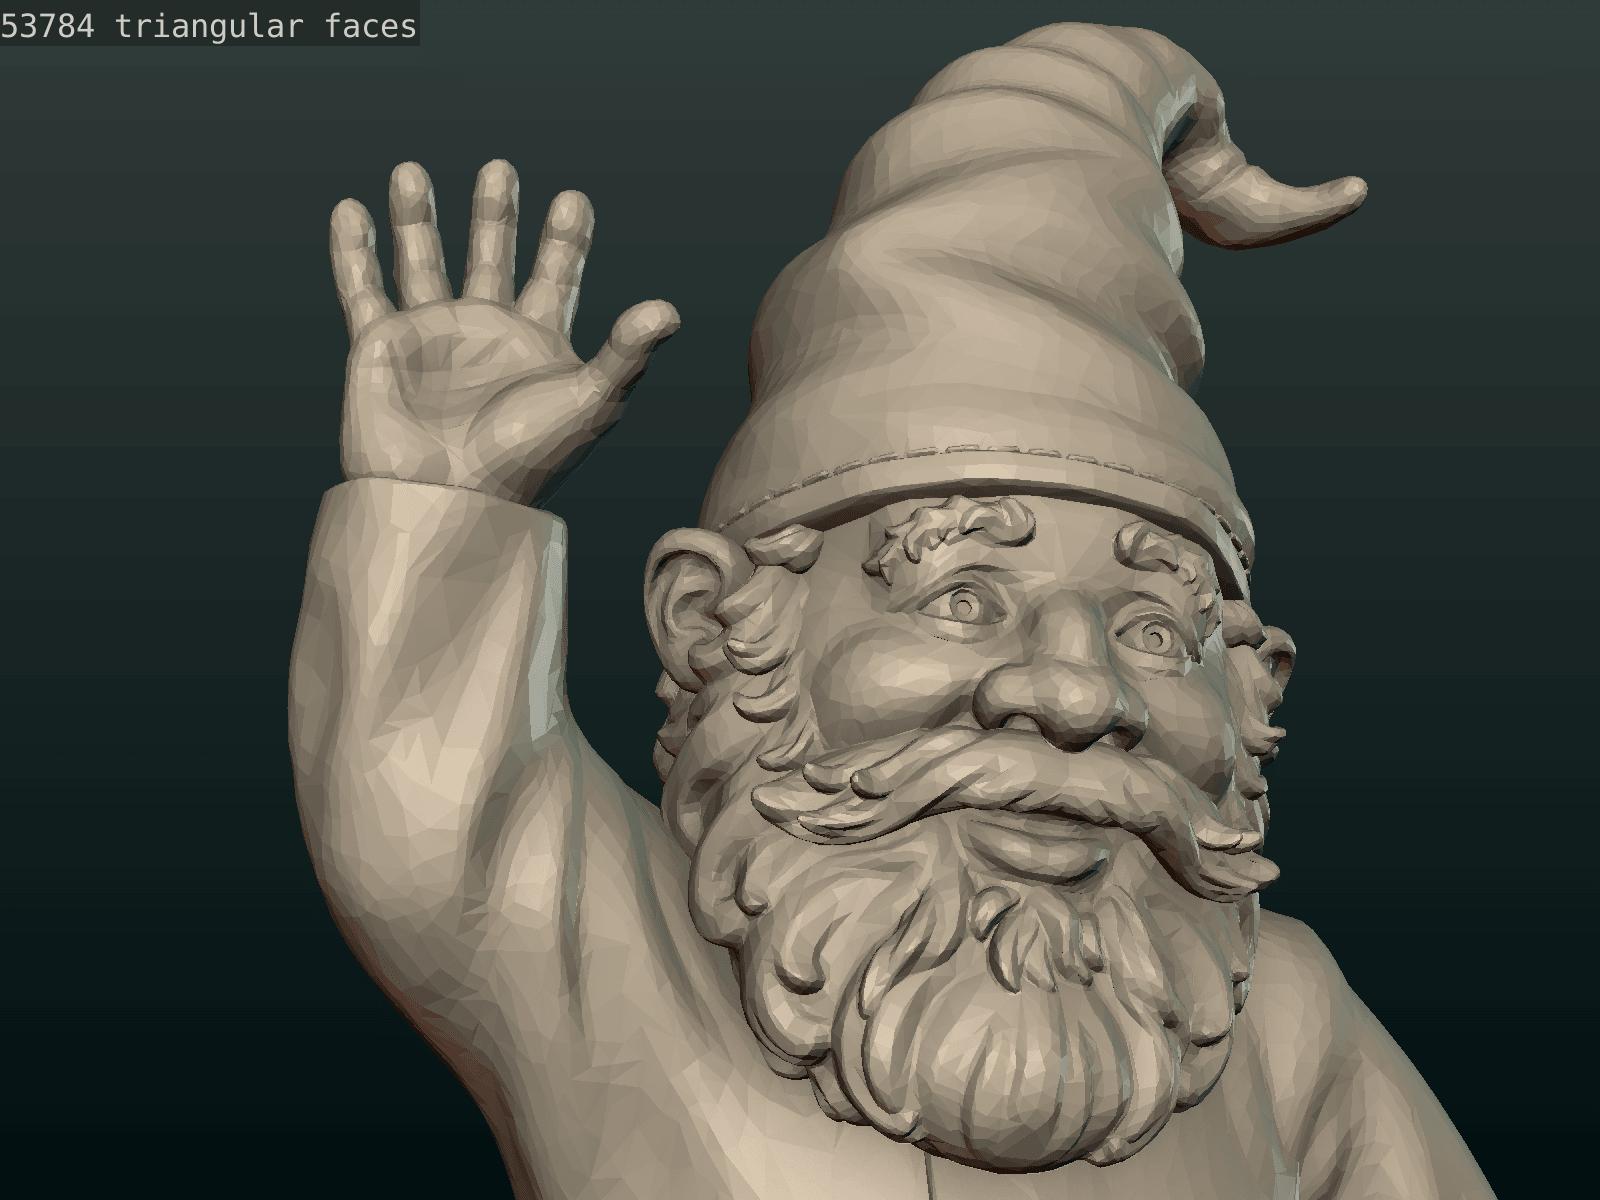 Garden_Gnome-25.png Download STL file Garden Gnome • 3D printing design, Skazok